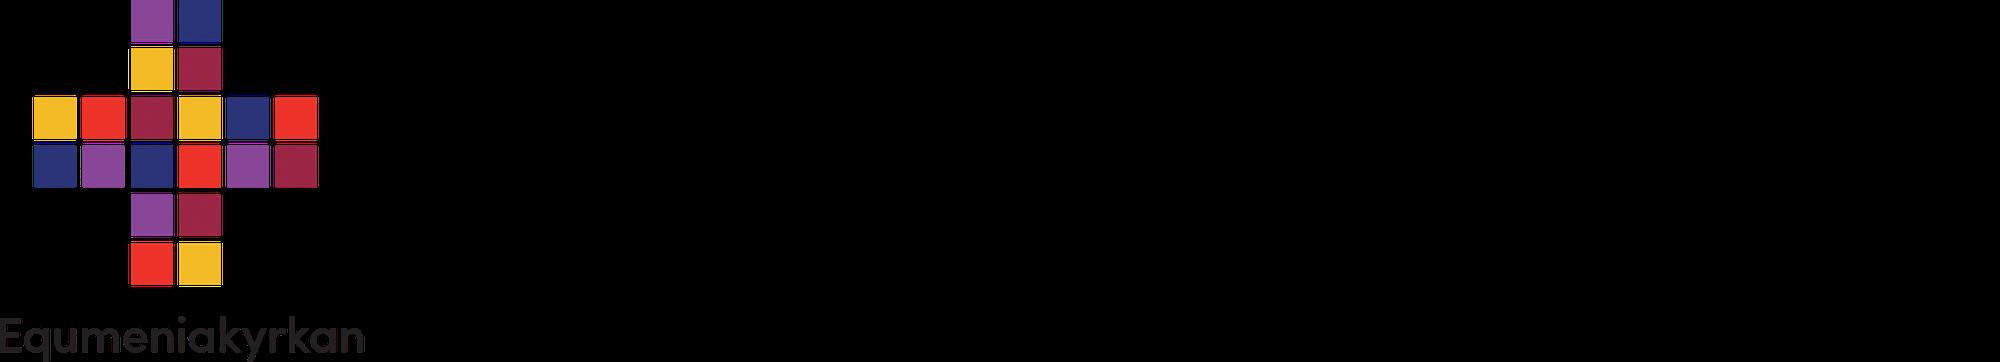 Sammilsdalkyrkan Leksand